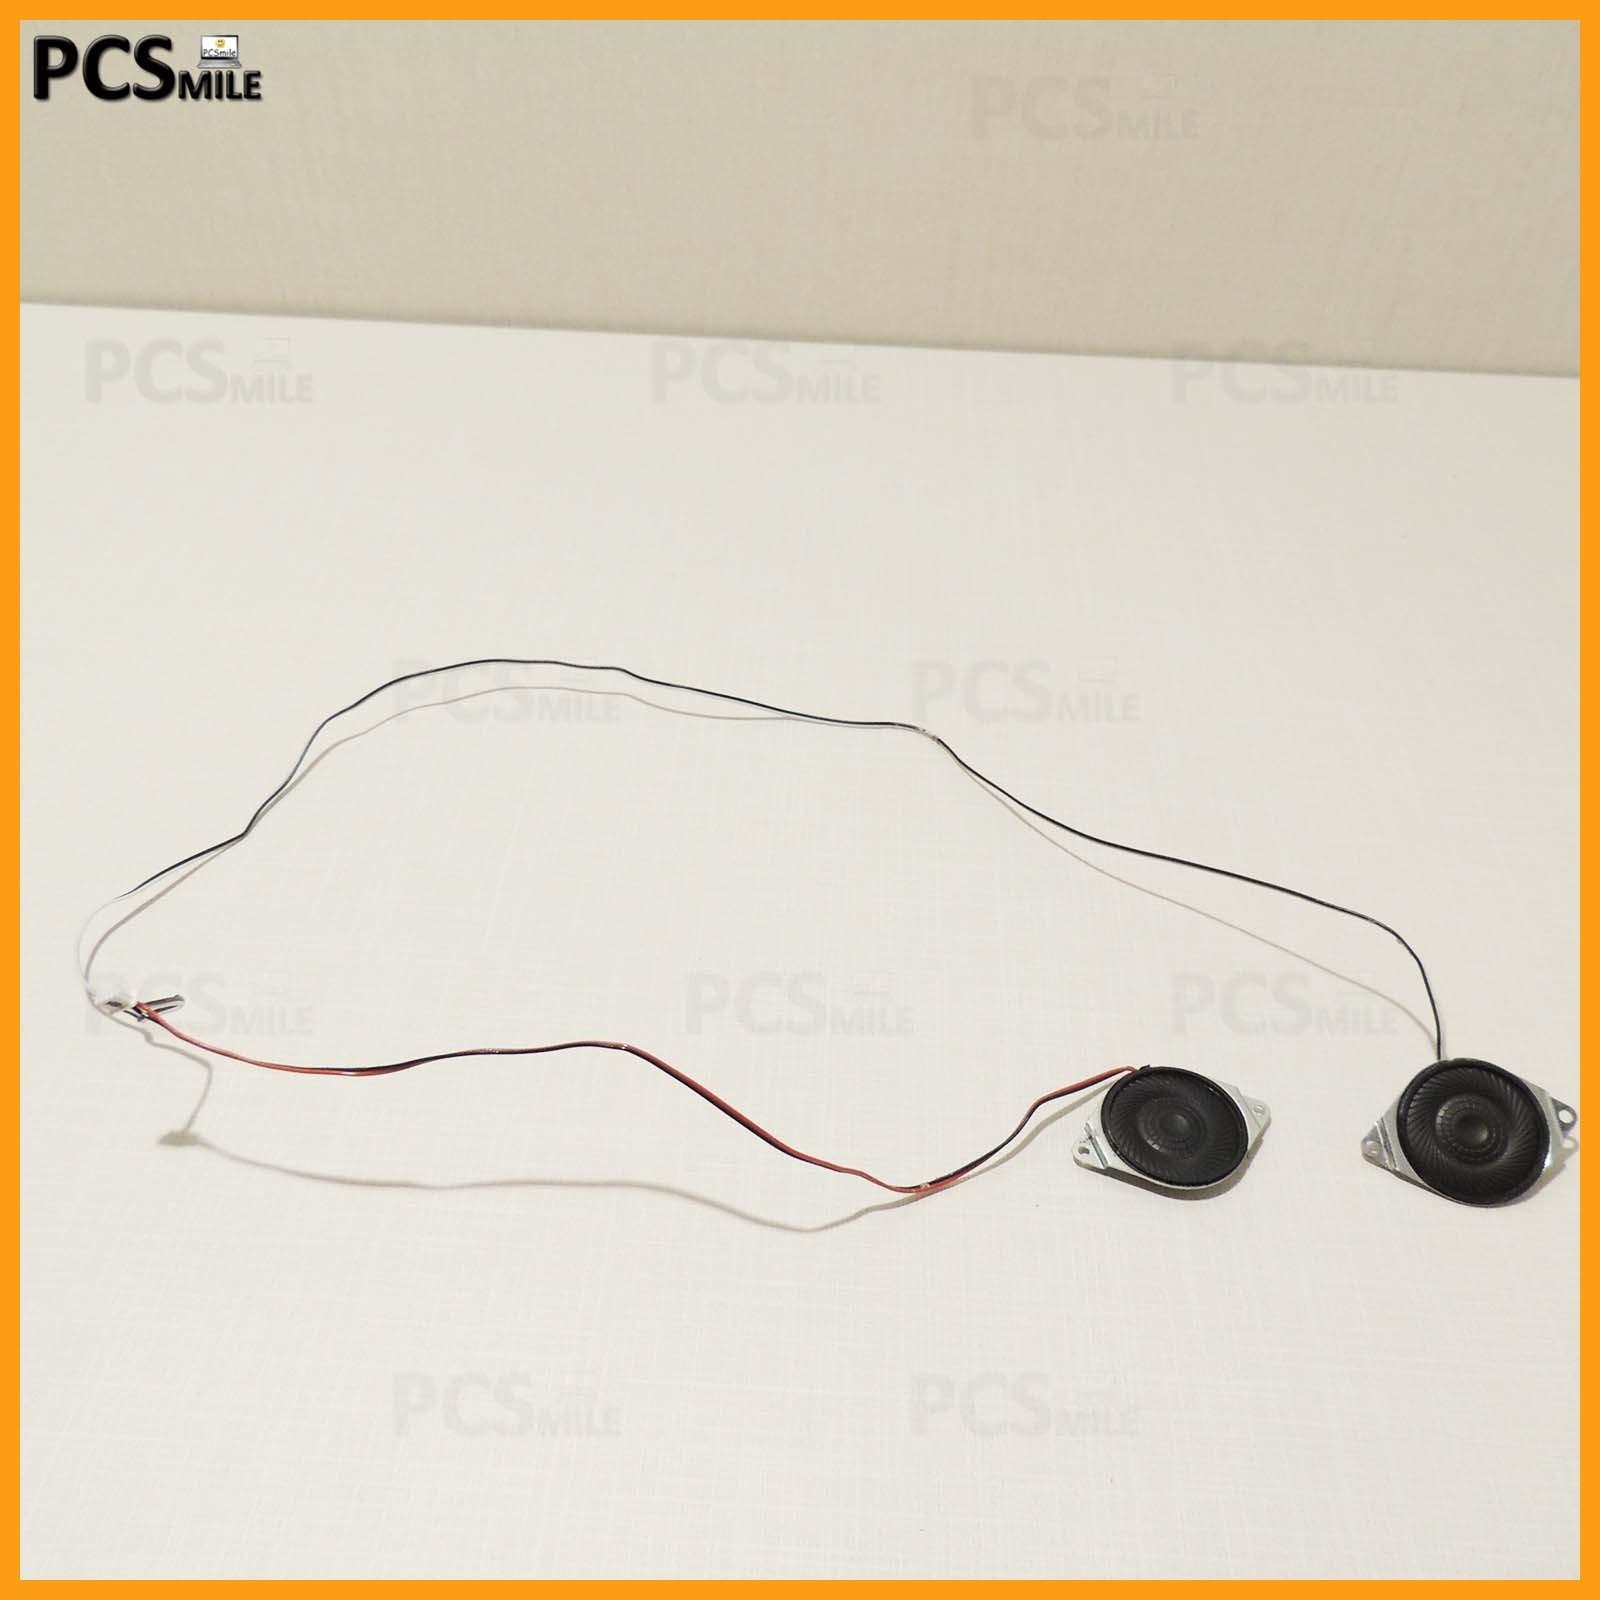 Speaker casse audio Amilo Pi 1505 BS032 Fujitsu Siemens 13-280901